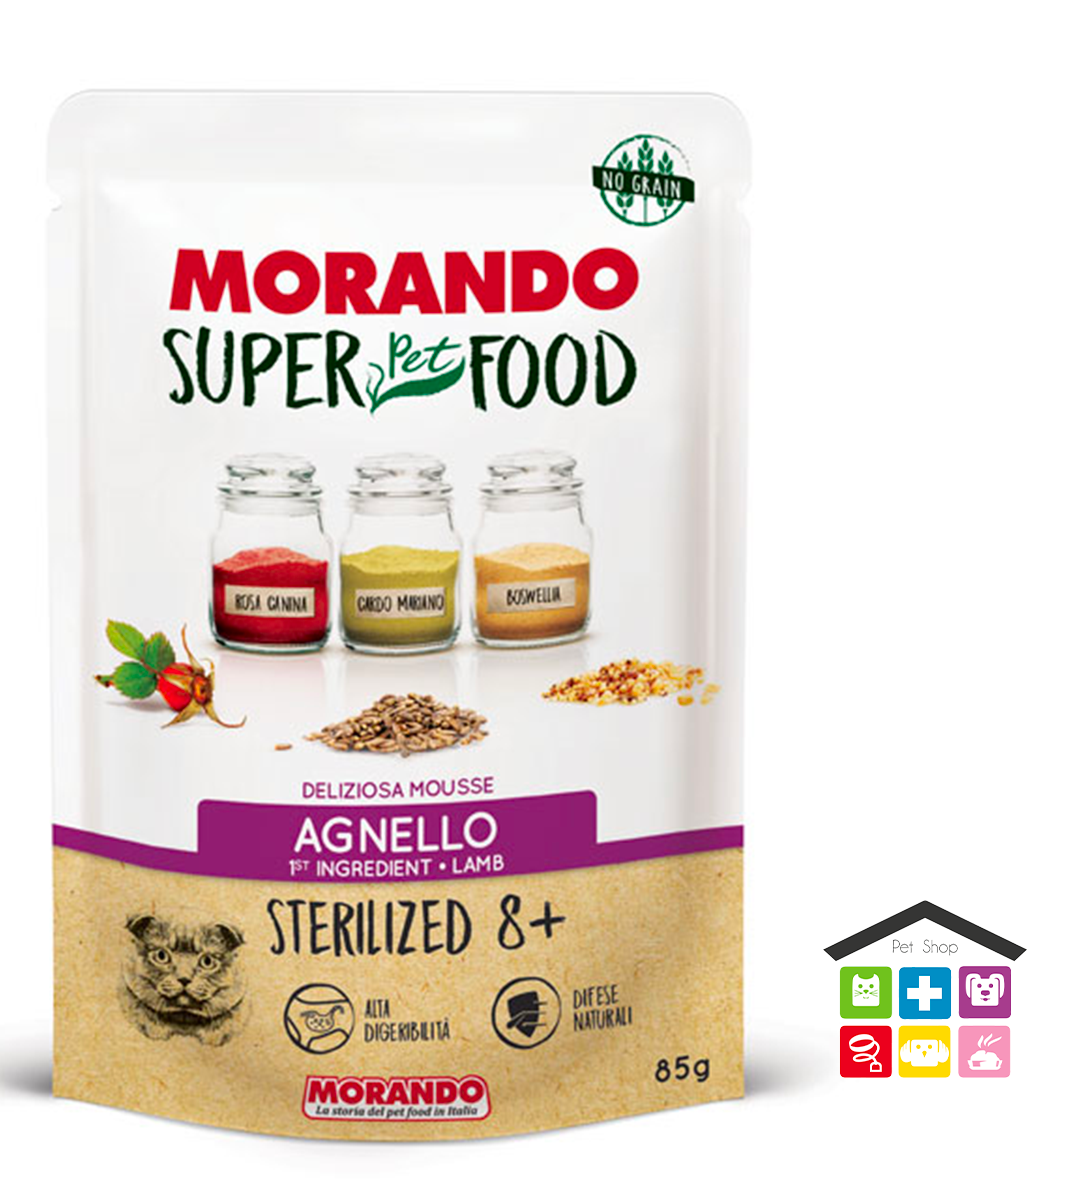 Morando SuperPetFood STERILIZED 8+ MOUSSE AGNELLO 0,85g bustina